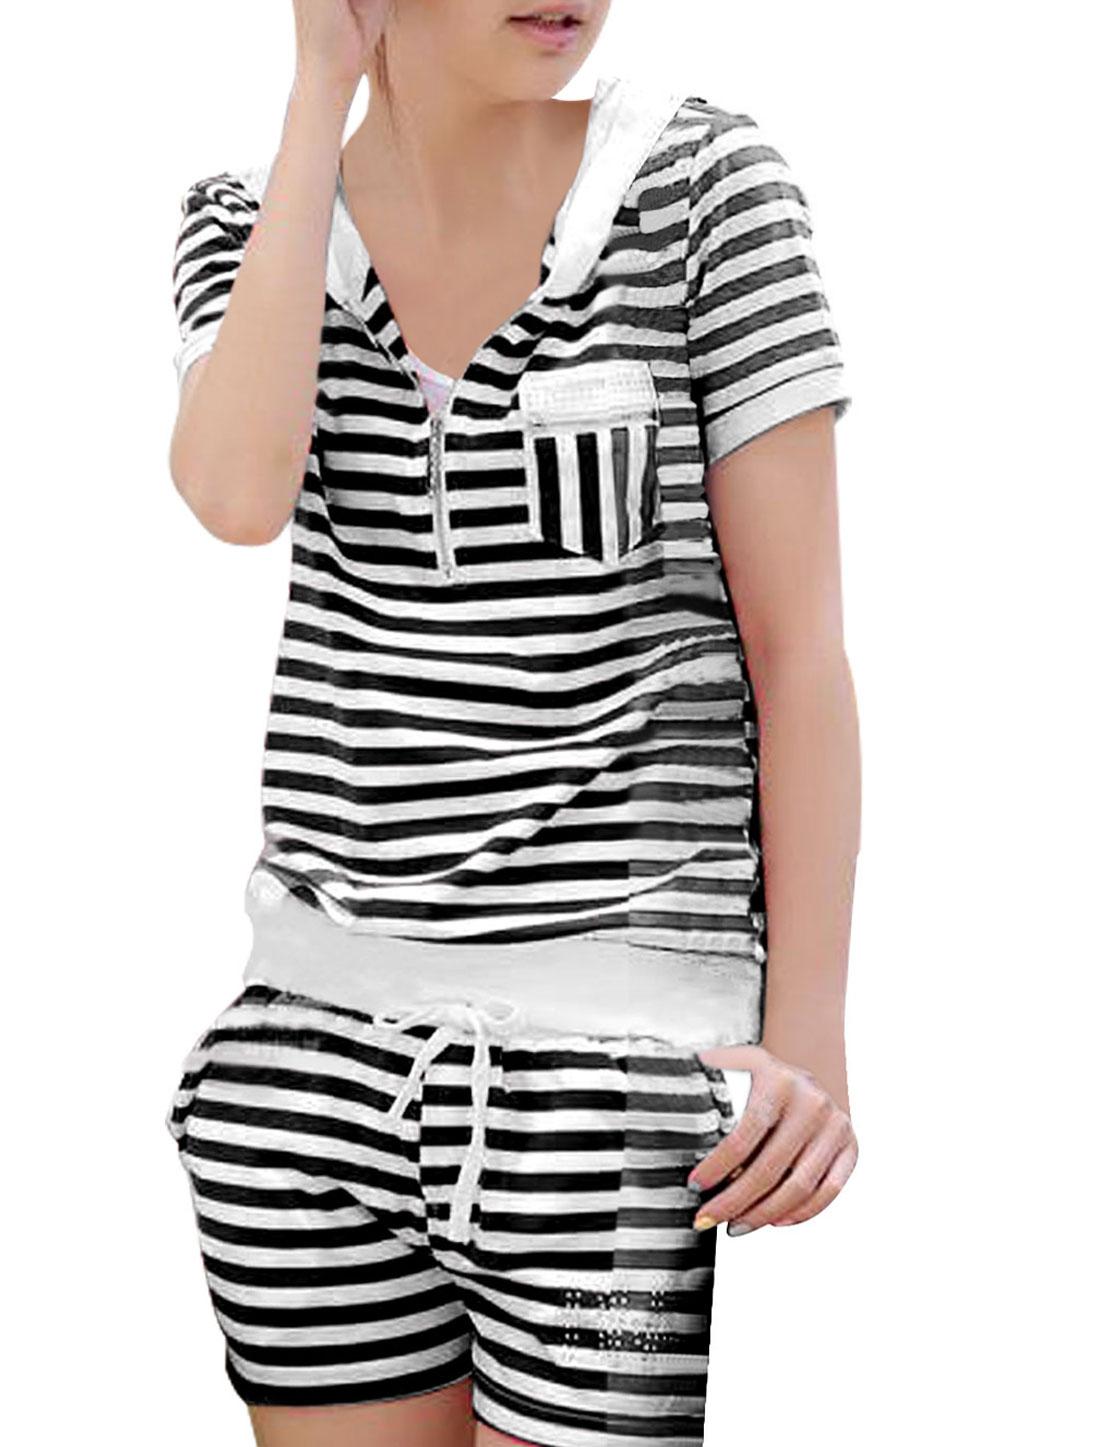 Allegra K Women's Zip Up Front Thin Hooded Top w Rhinestone Decor Shorts (Size XS / 2)